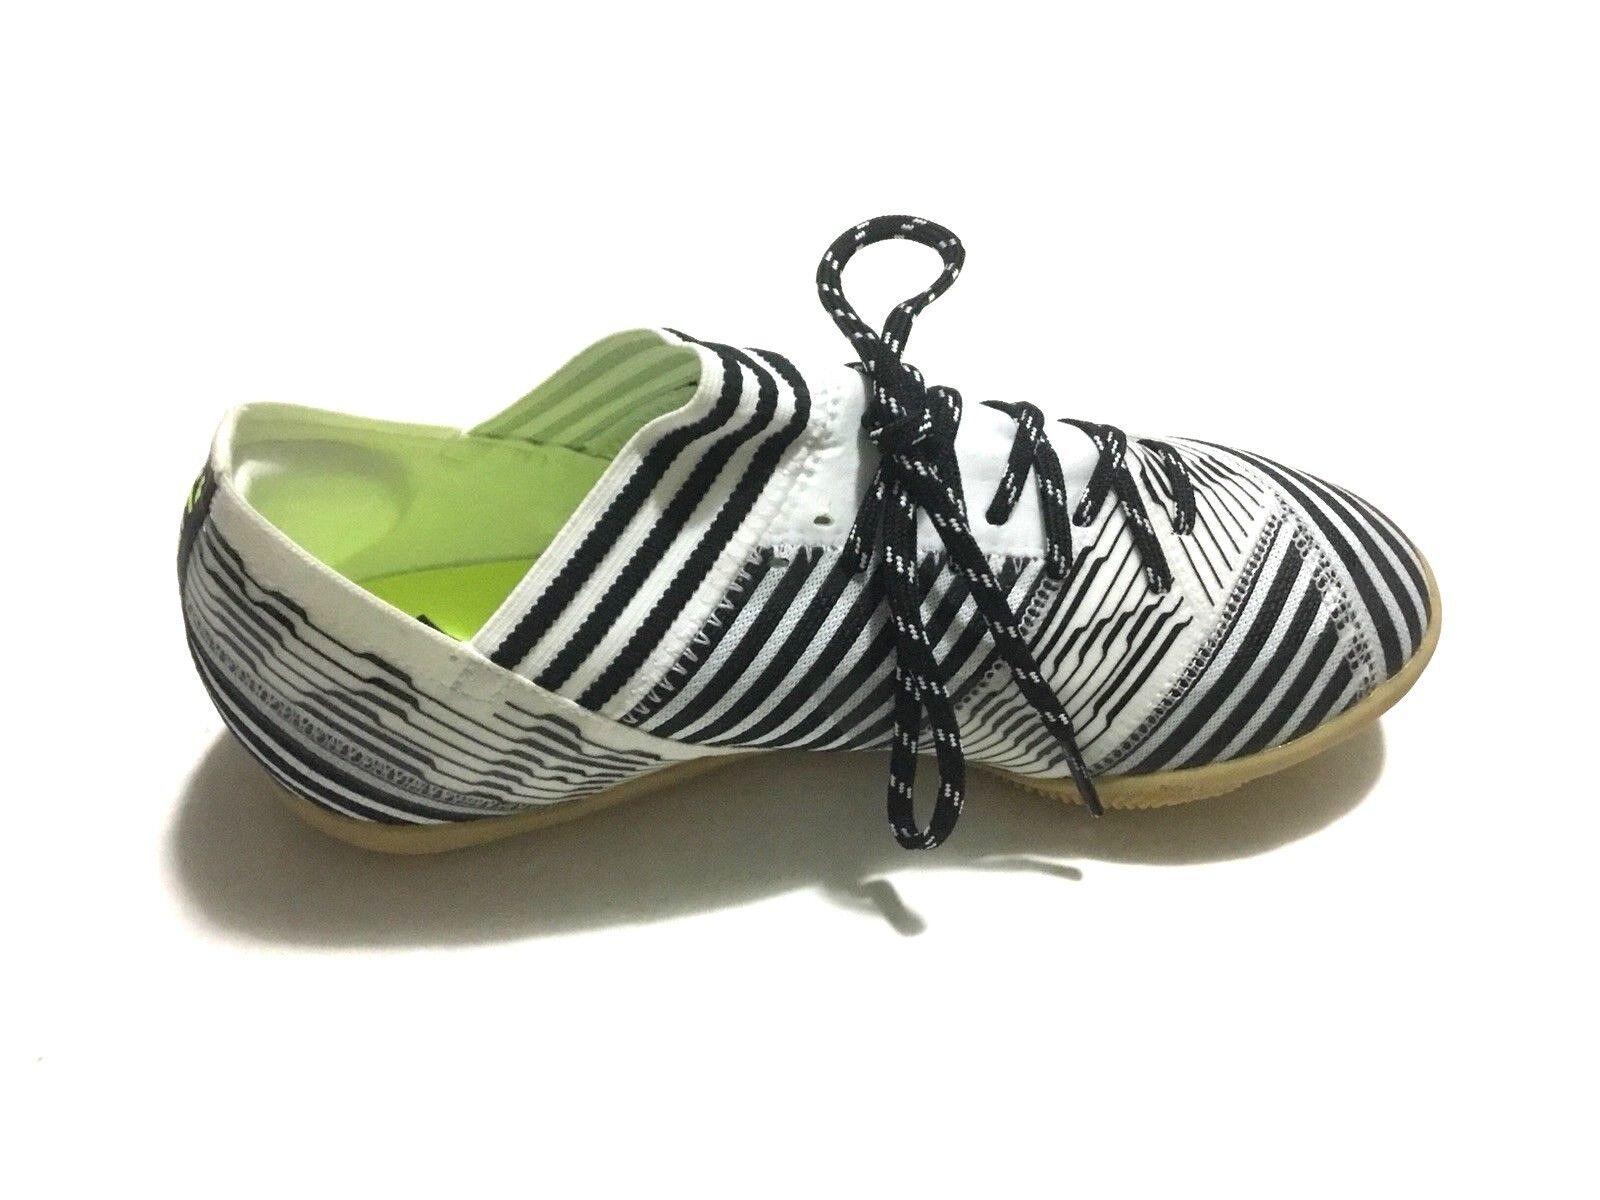 adidas originals männer nemeziz - tango 17,3 rasen fußball - nemeziz größe. a79ce5